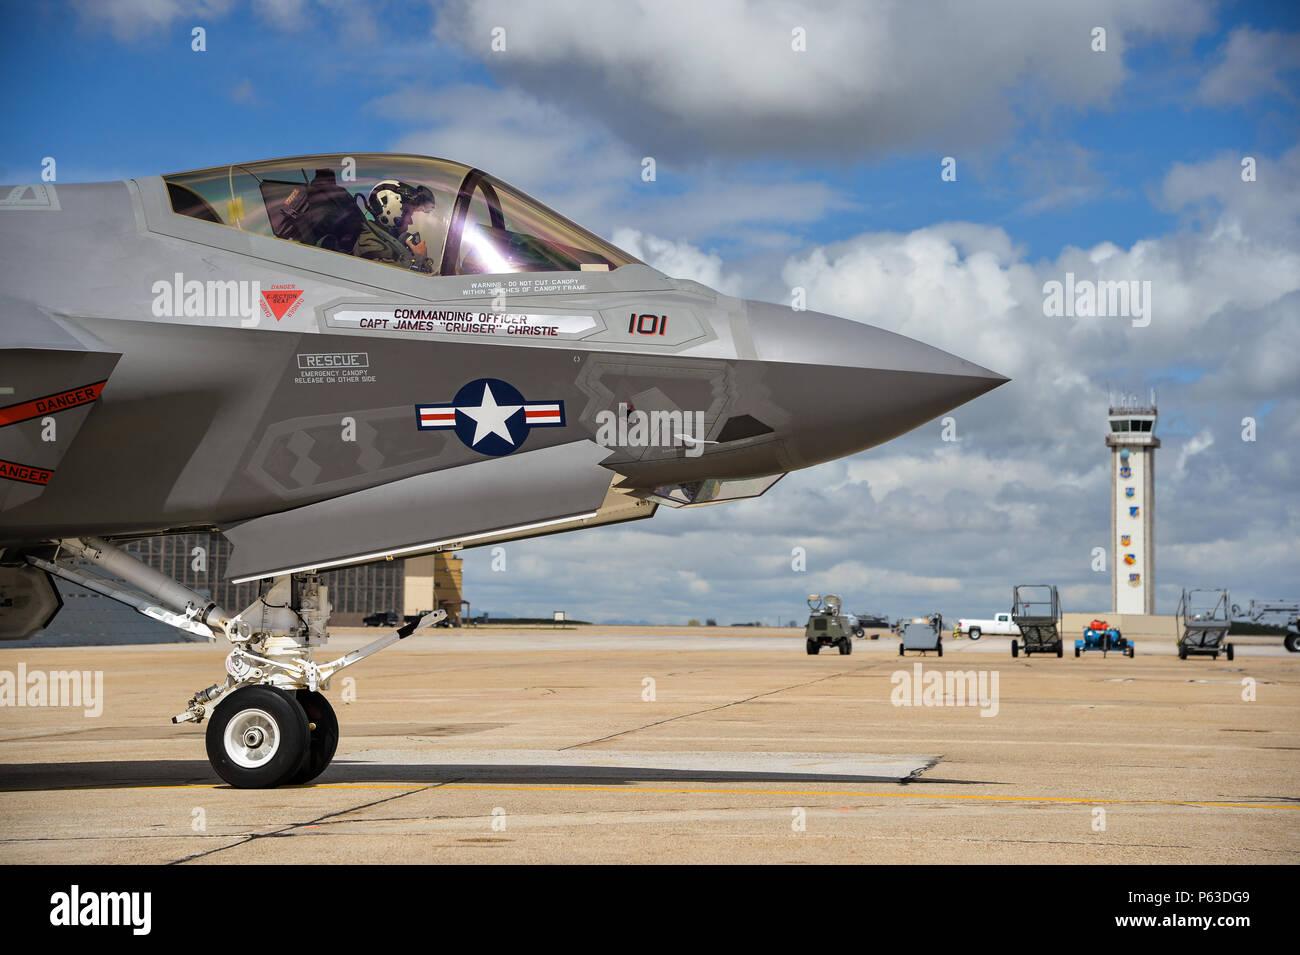 An f 35 aircraft arrives april 15 at hill force base utah the